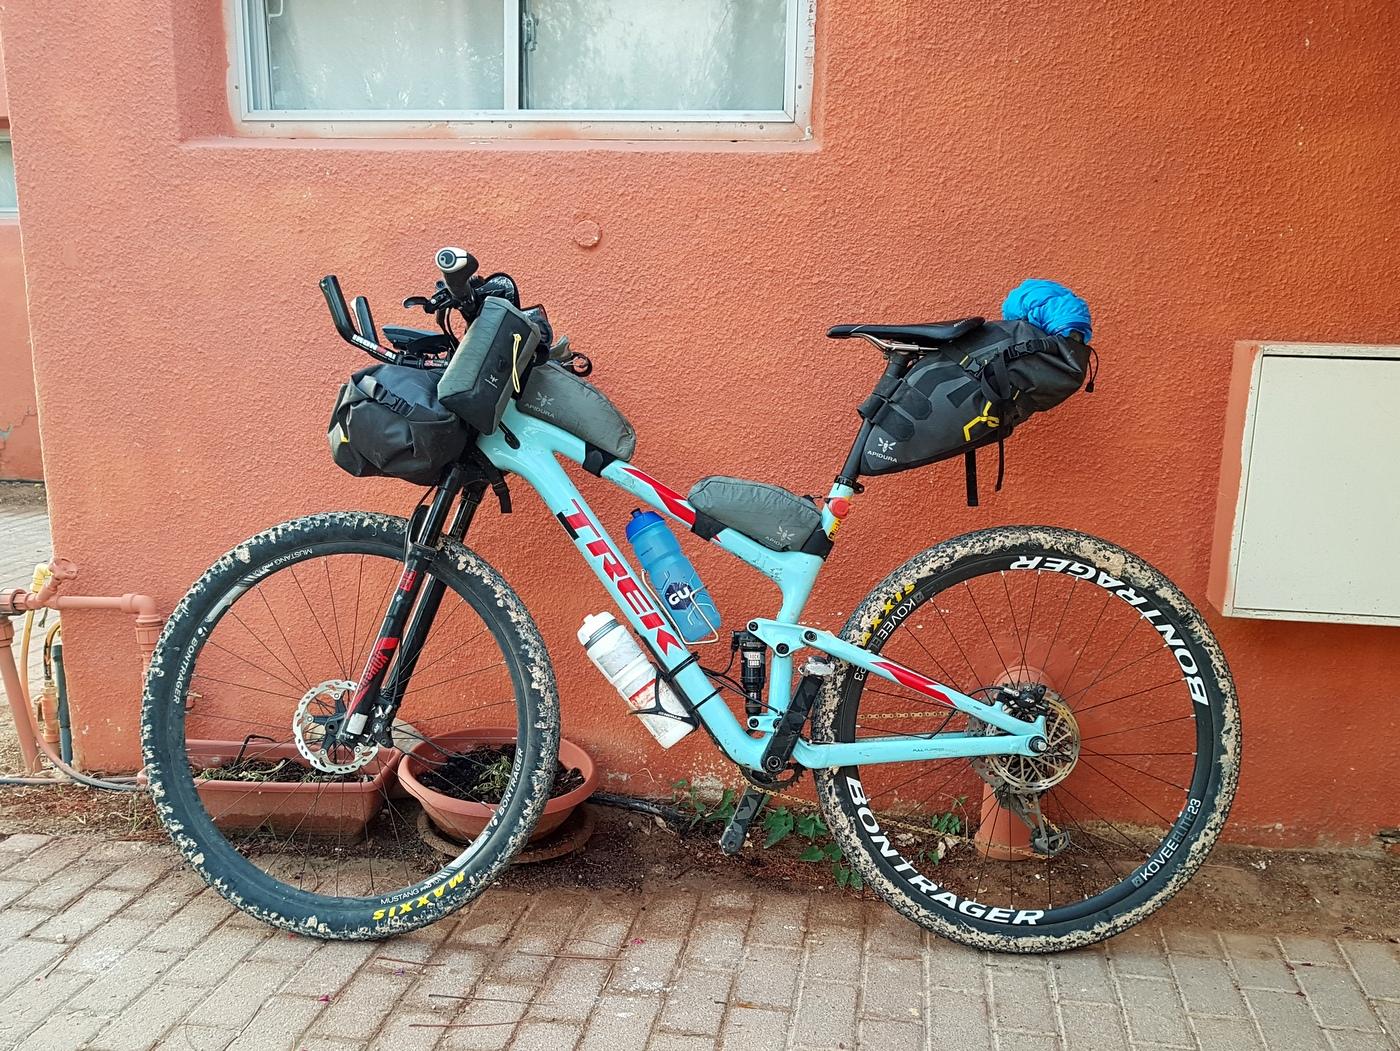 HLC - כל הציוד על האופניים